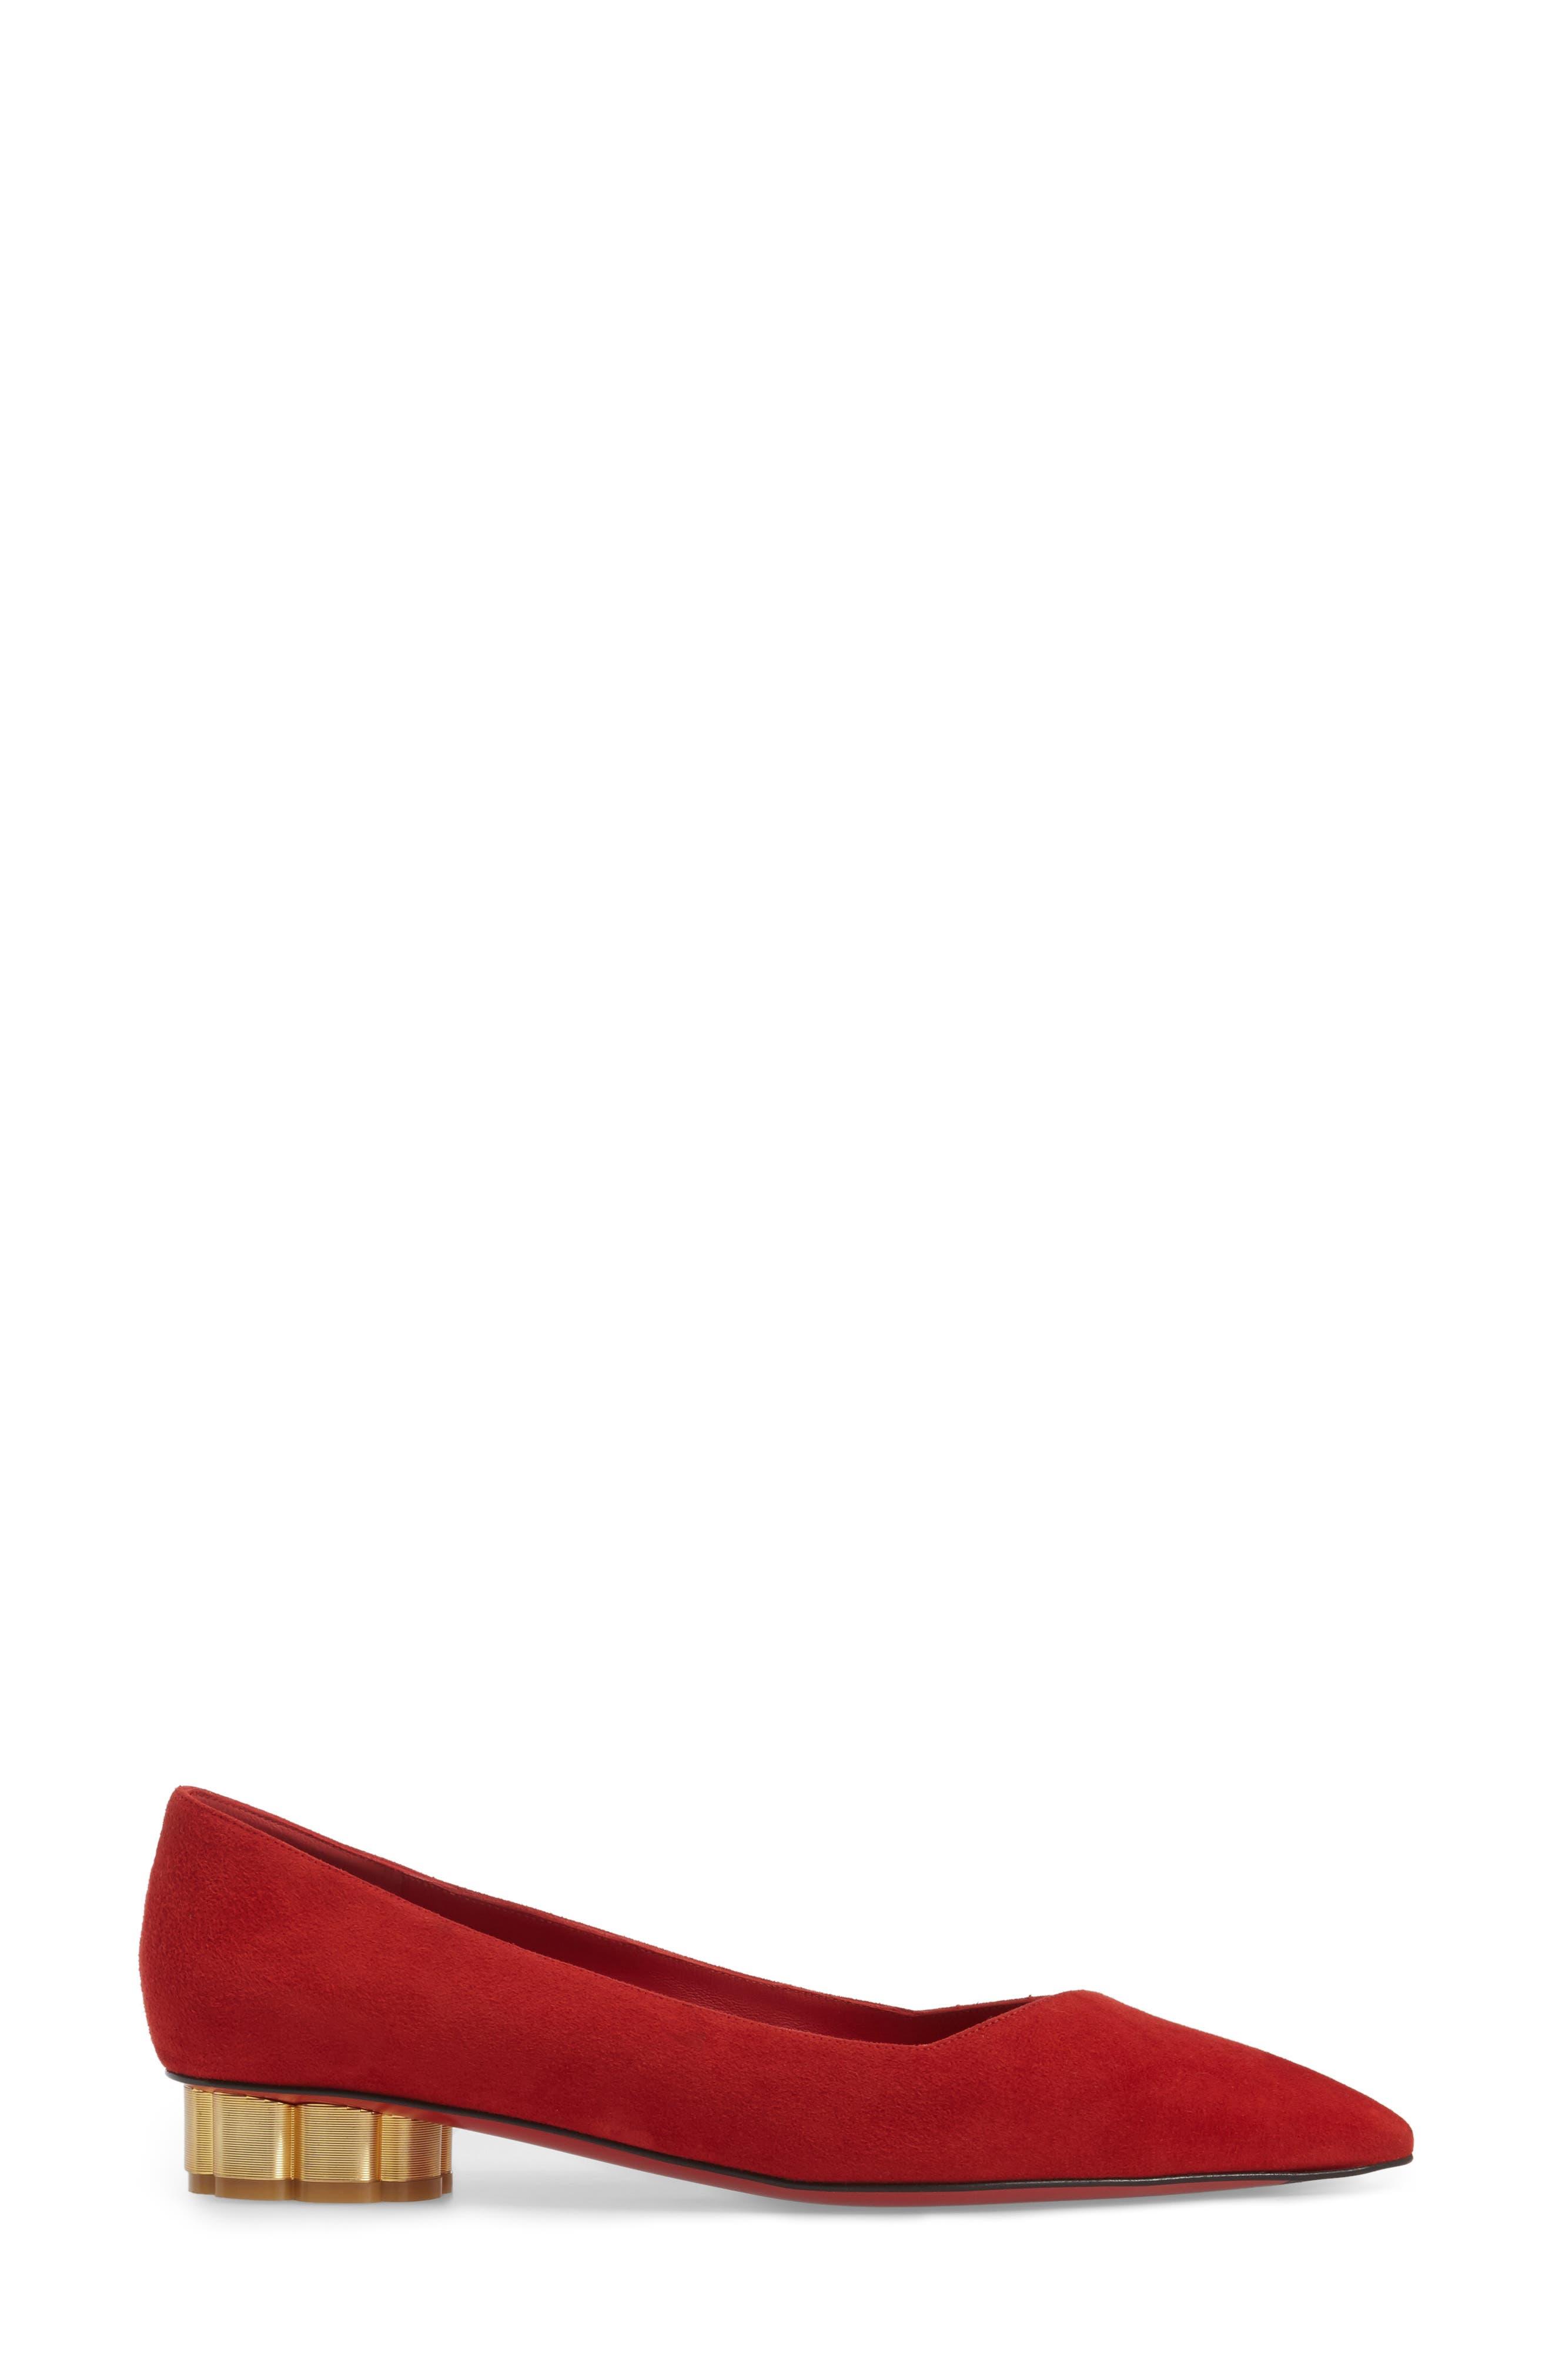 Alternate Image 3  - Salvatore Ferragamo Flower Heel Pump (Women)